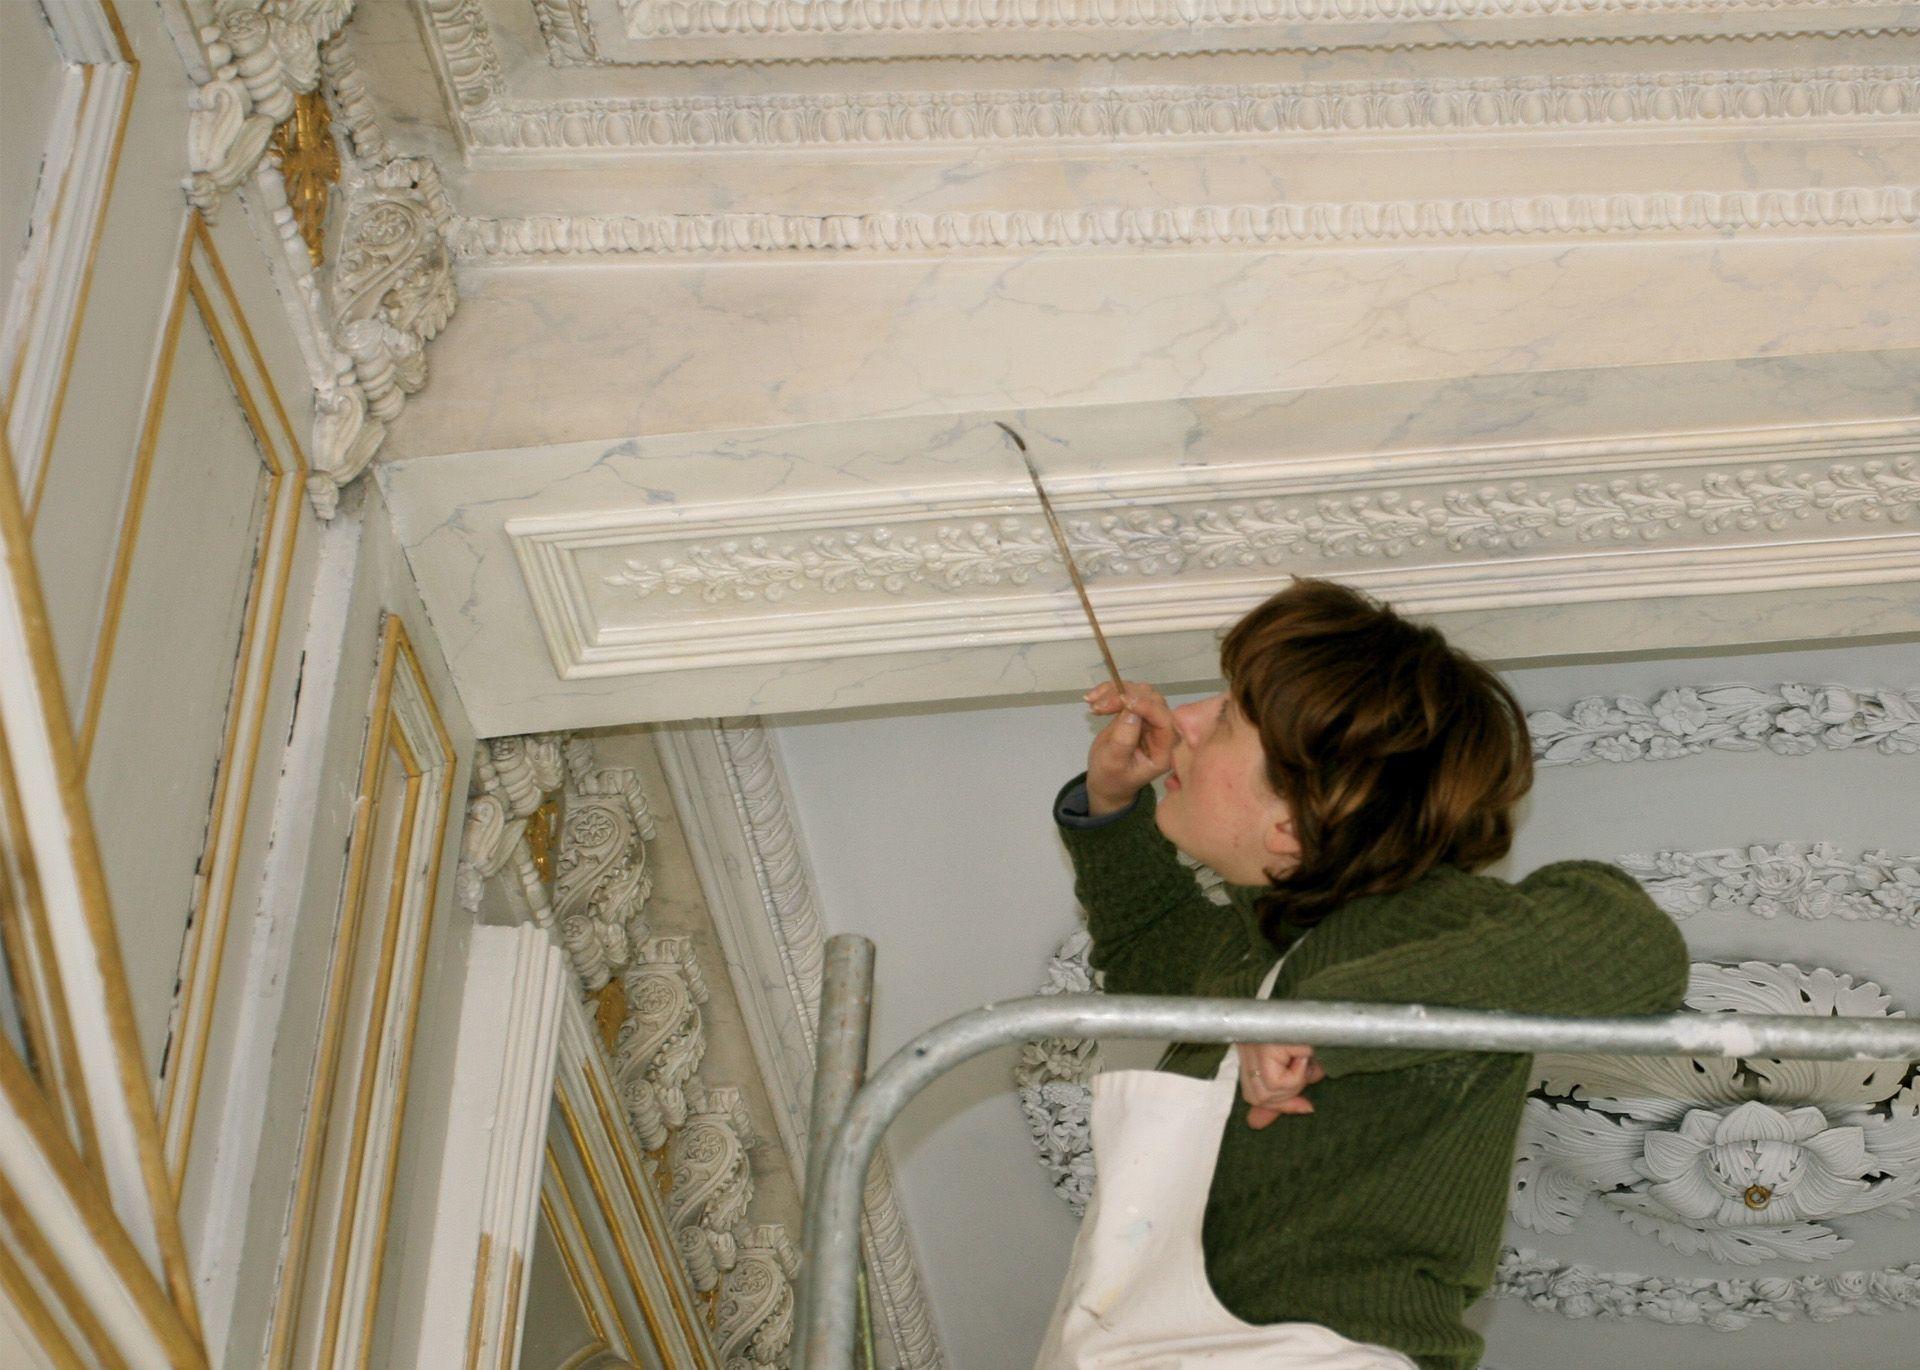 restauration faux marbre karine_resultat